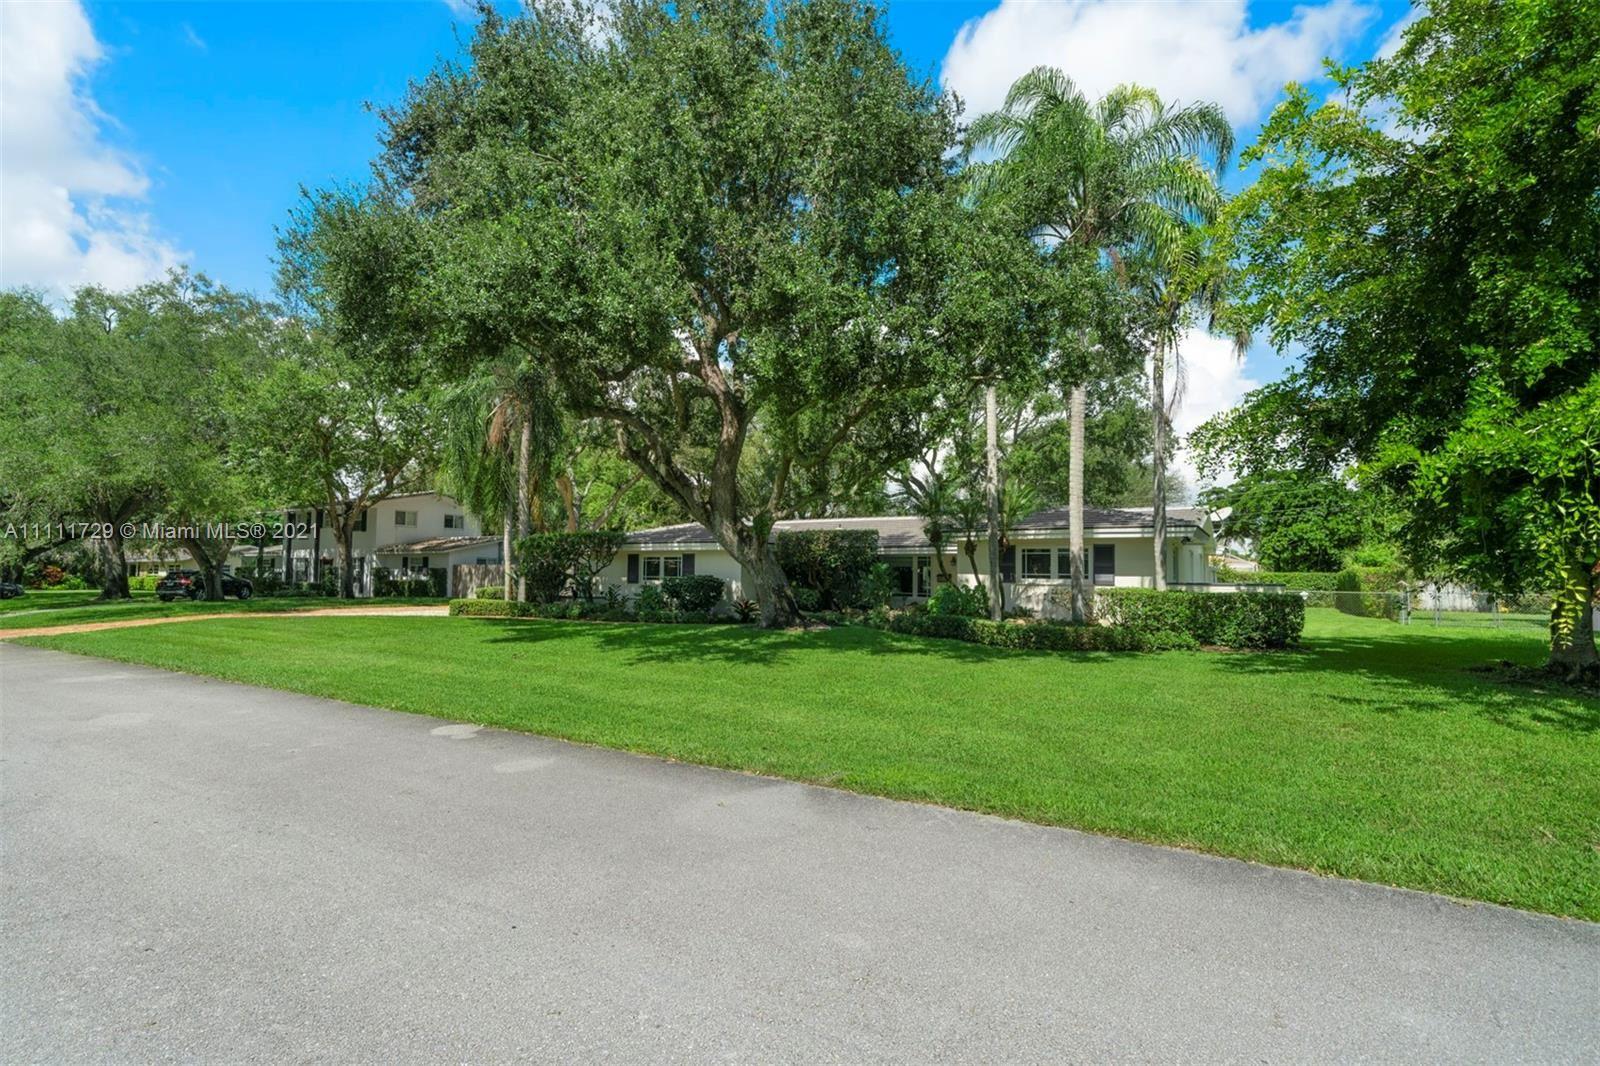 Photo of 7725 SW 143rd St, Palmetto Bay, FL 33158 (MLS # A11111729)